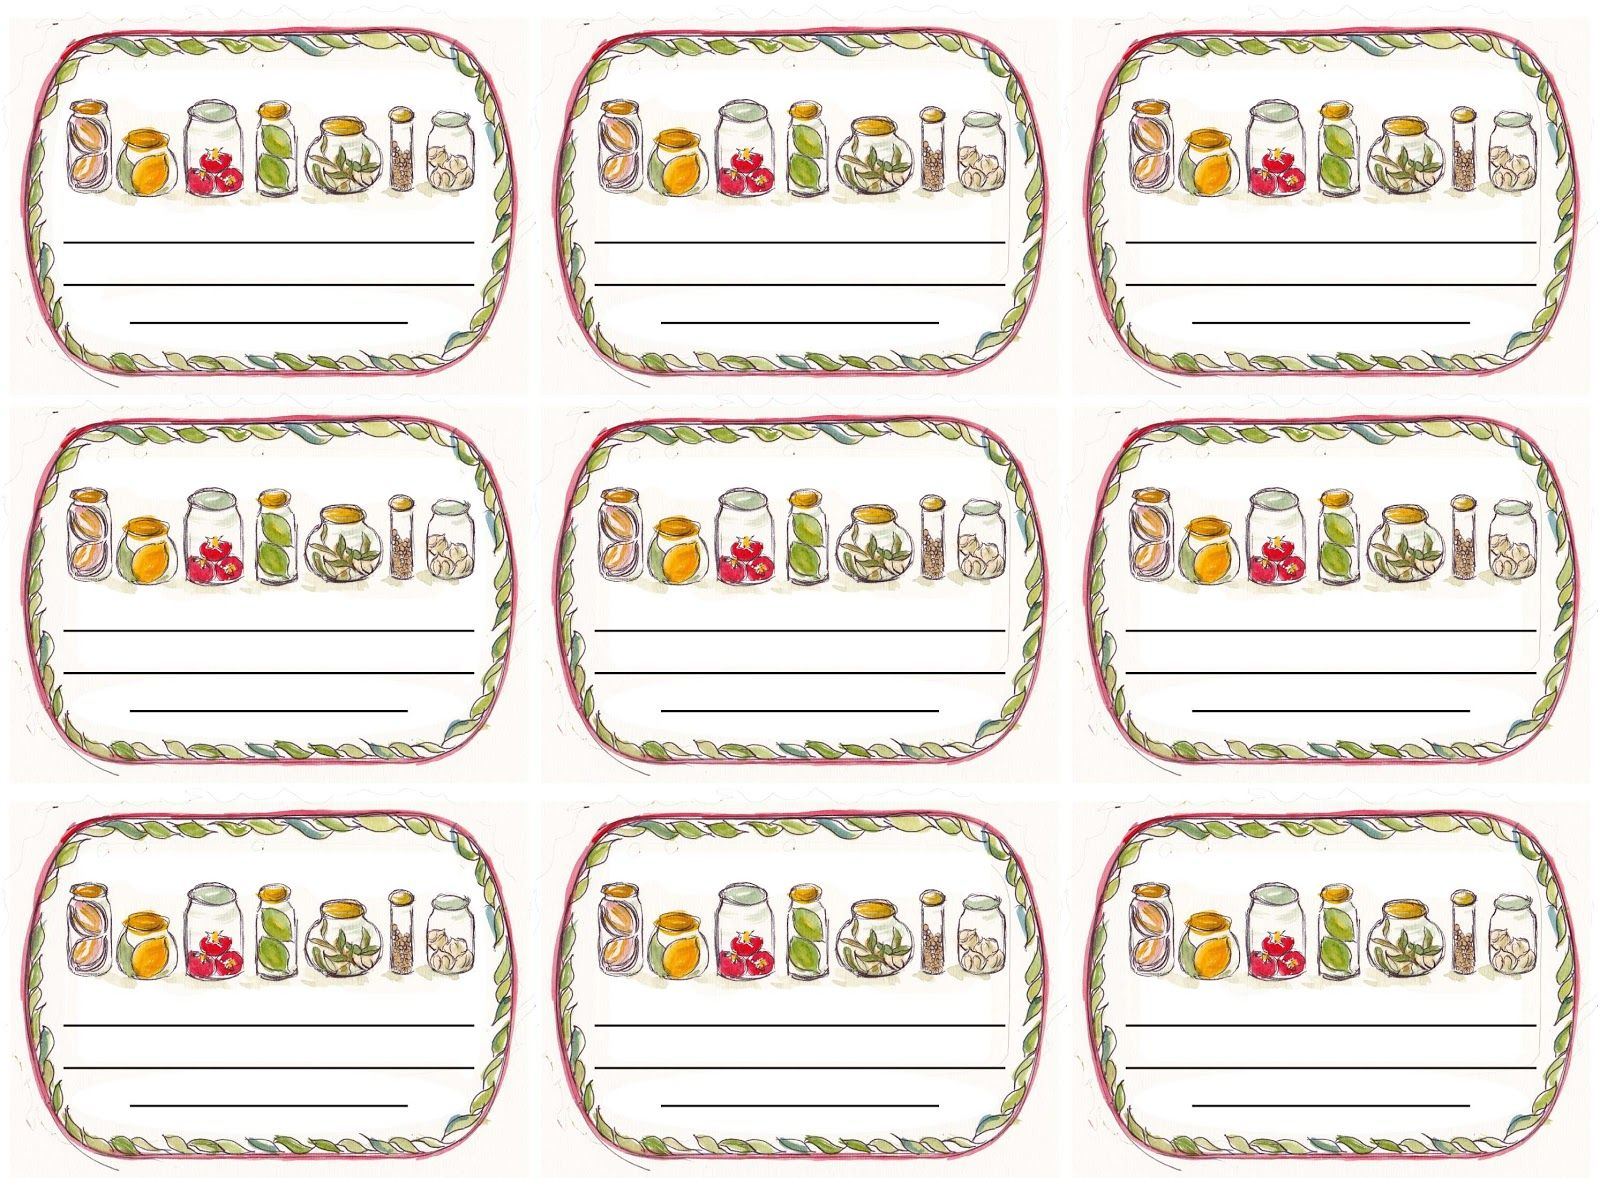 Pin On Jar Labels Baby food jar labels template